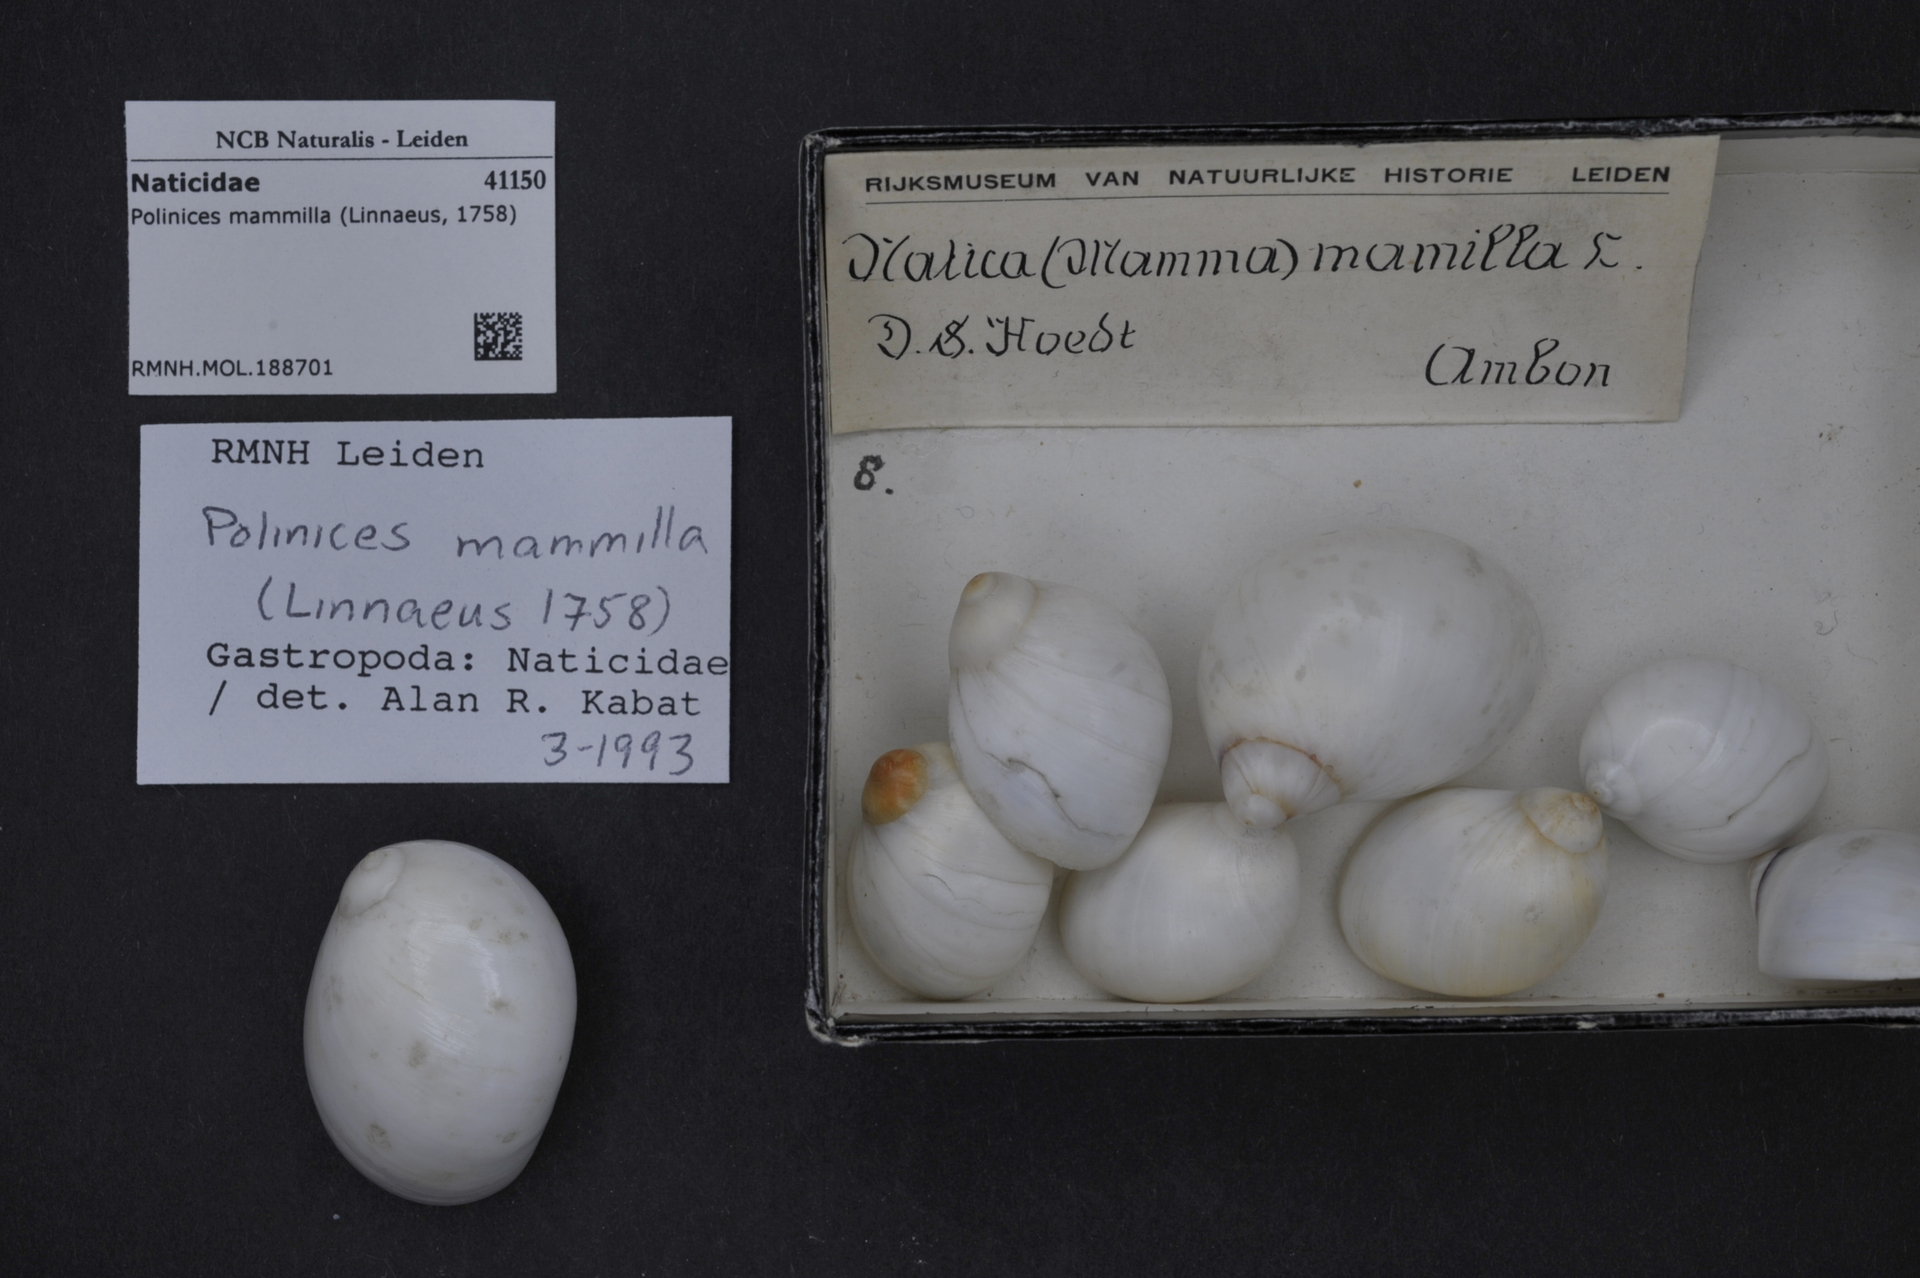 RMNH.MOL.188701 | Polinices mammilla (Linnaeus, 1758)